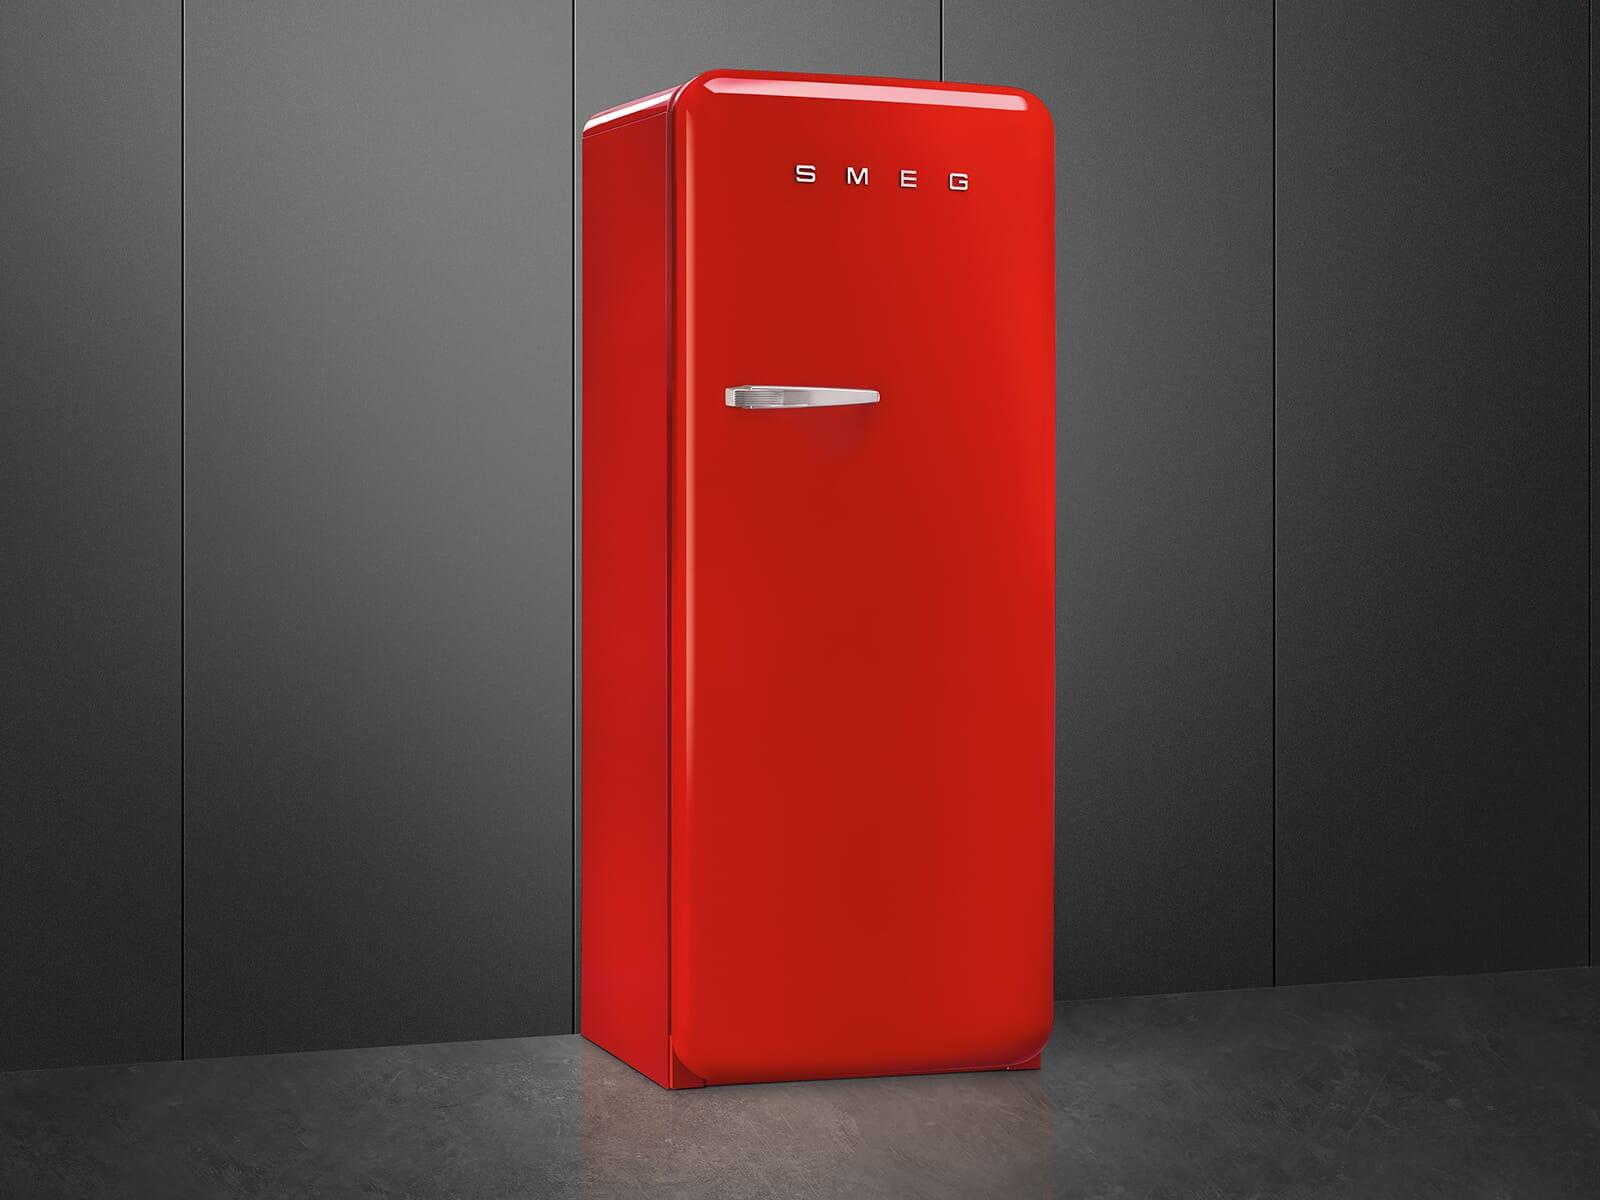 Smeg Kühlschrank Bewertung : Smeg küchenmaschine erfahrungen smeg kühlschrank